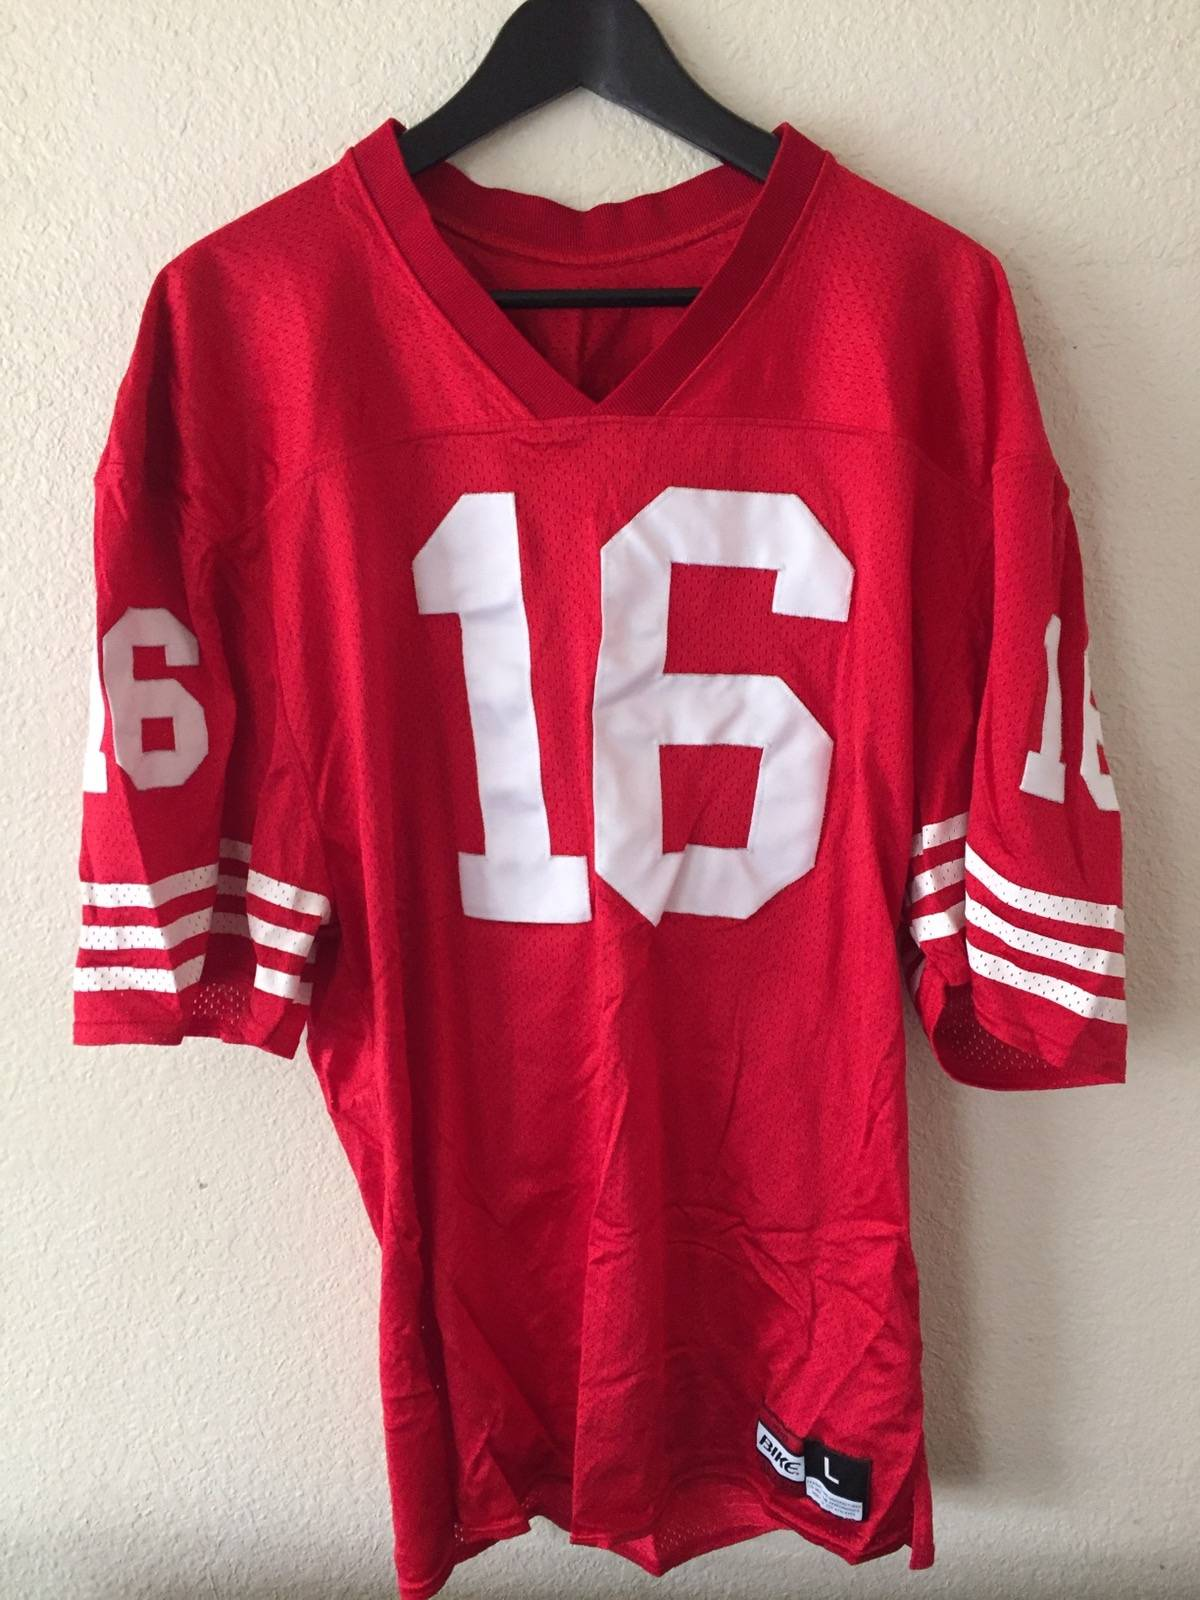 huge discount dee5a 16961 Jersey Joe Montana 49ers Throwback Jersey Size L $54